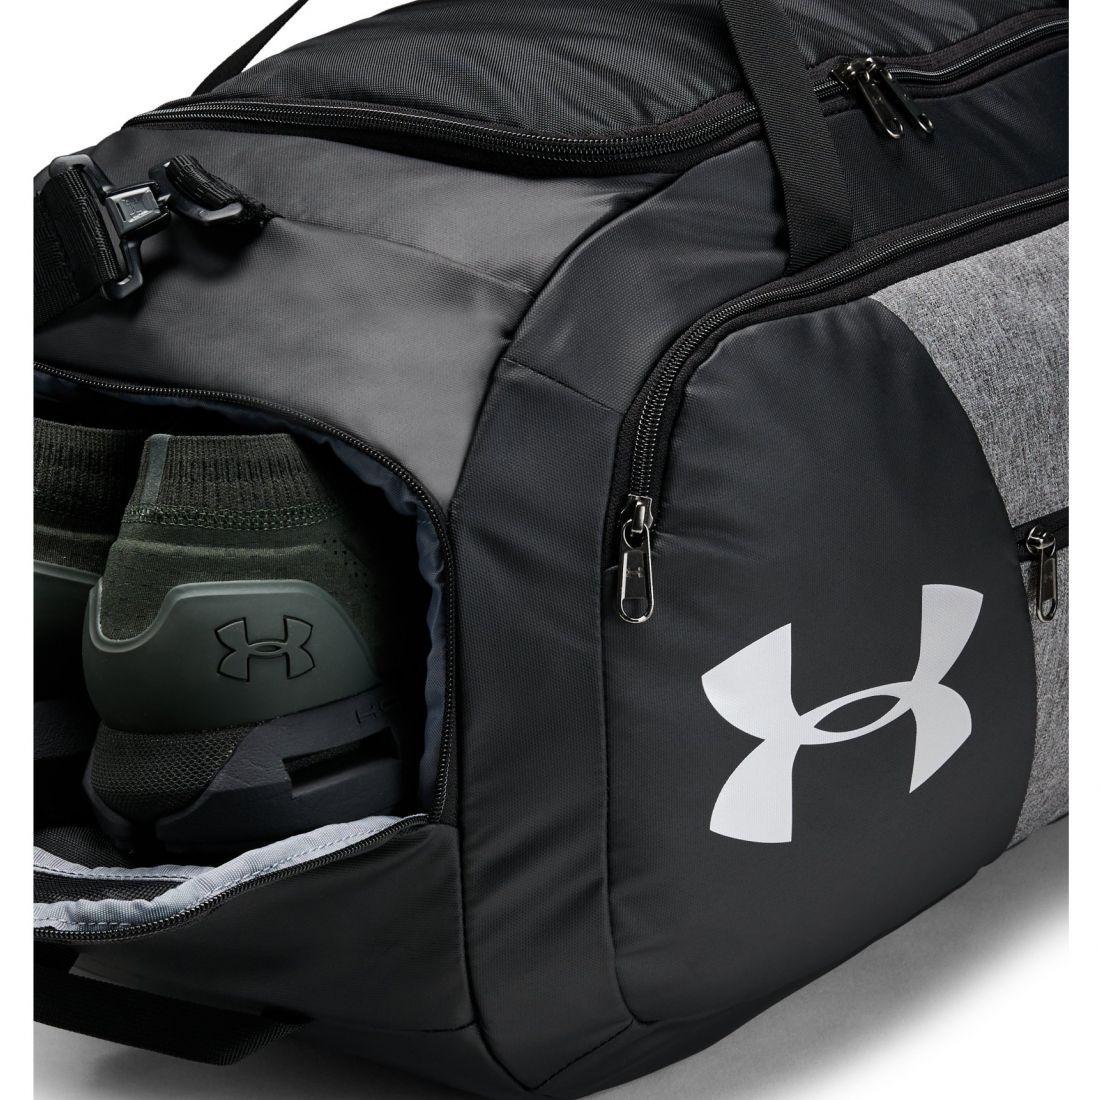 Rucsaci & Genți -  under armour UA Undeniable 4.0 Medium Duffle Bag 2657